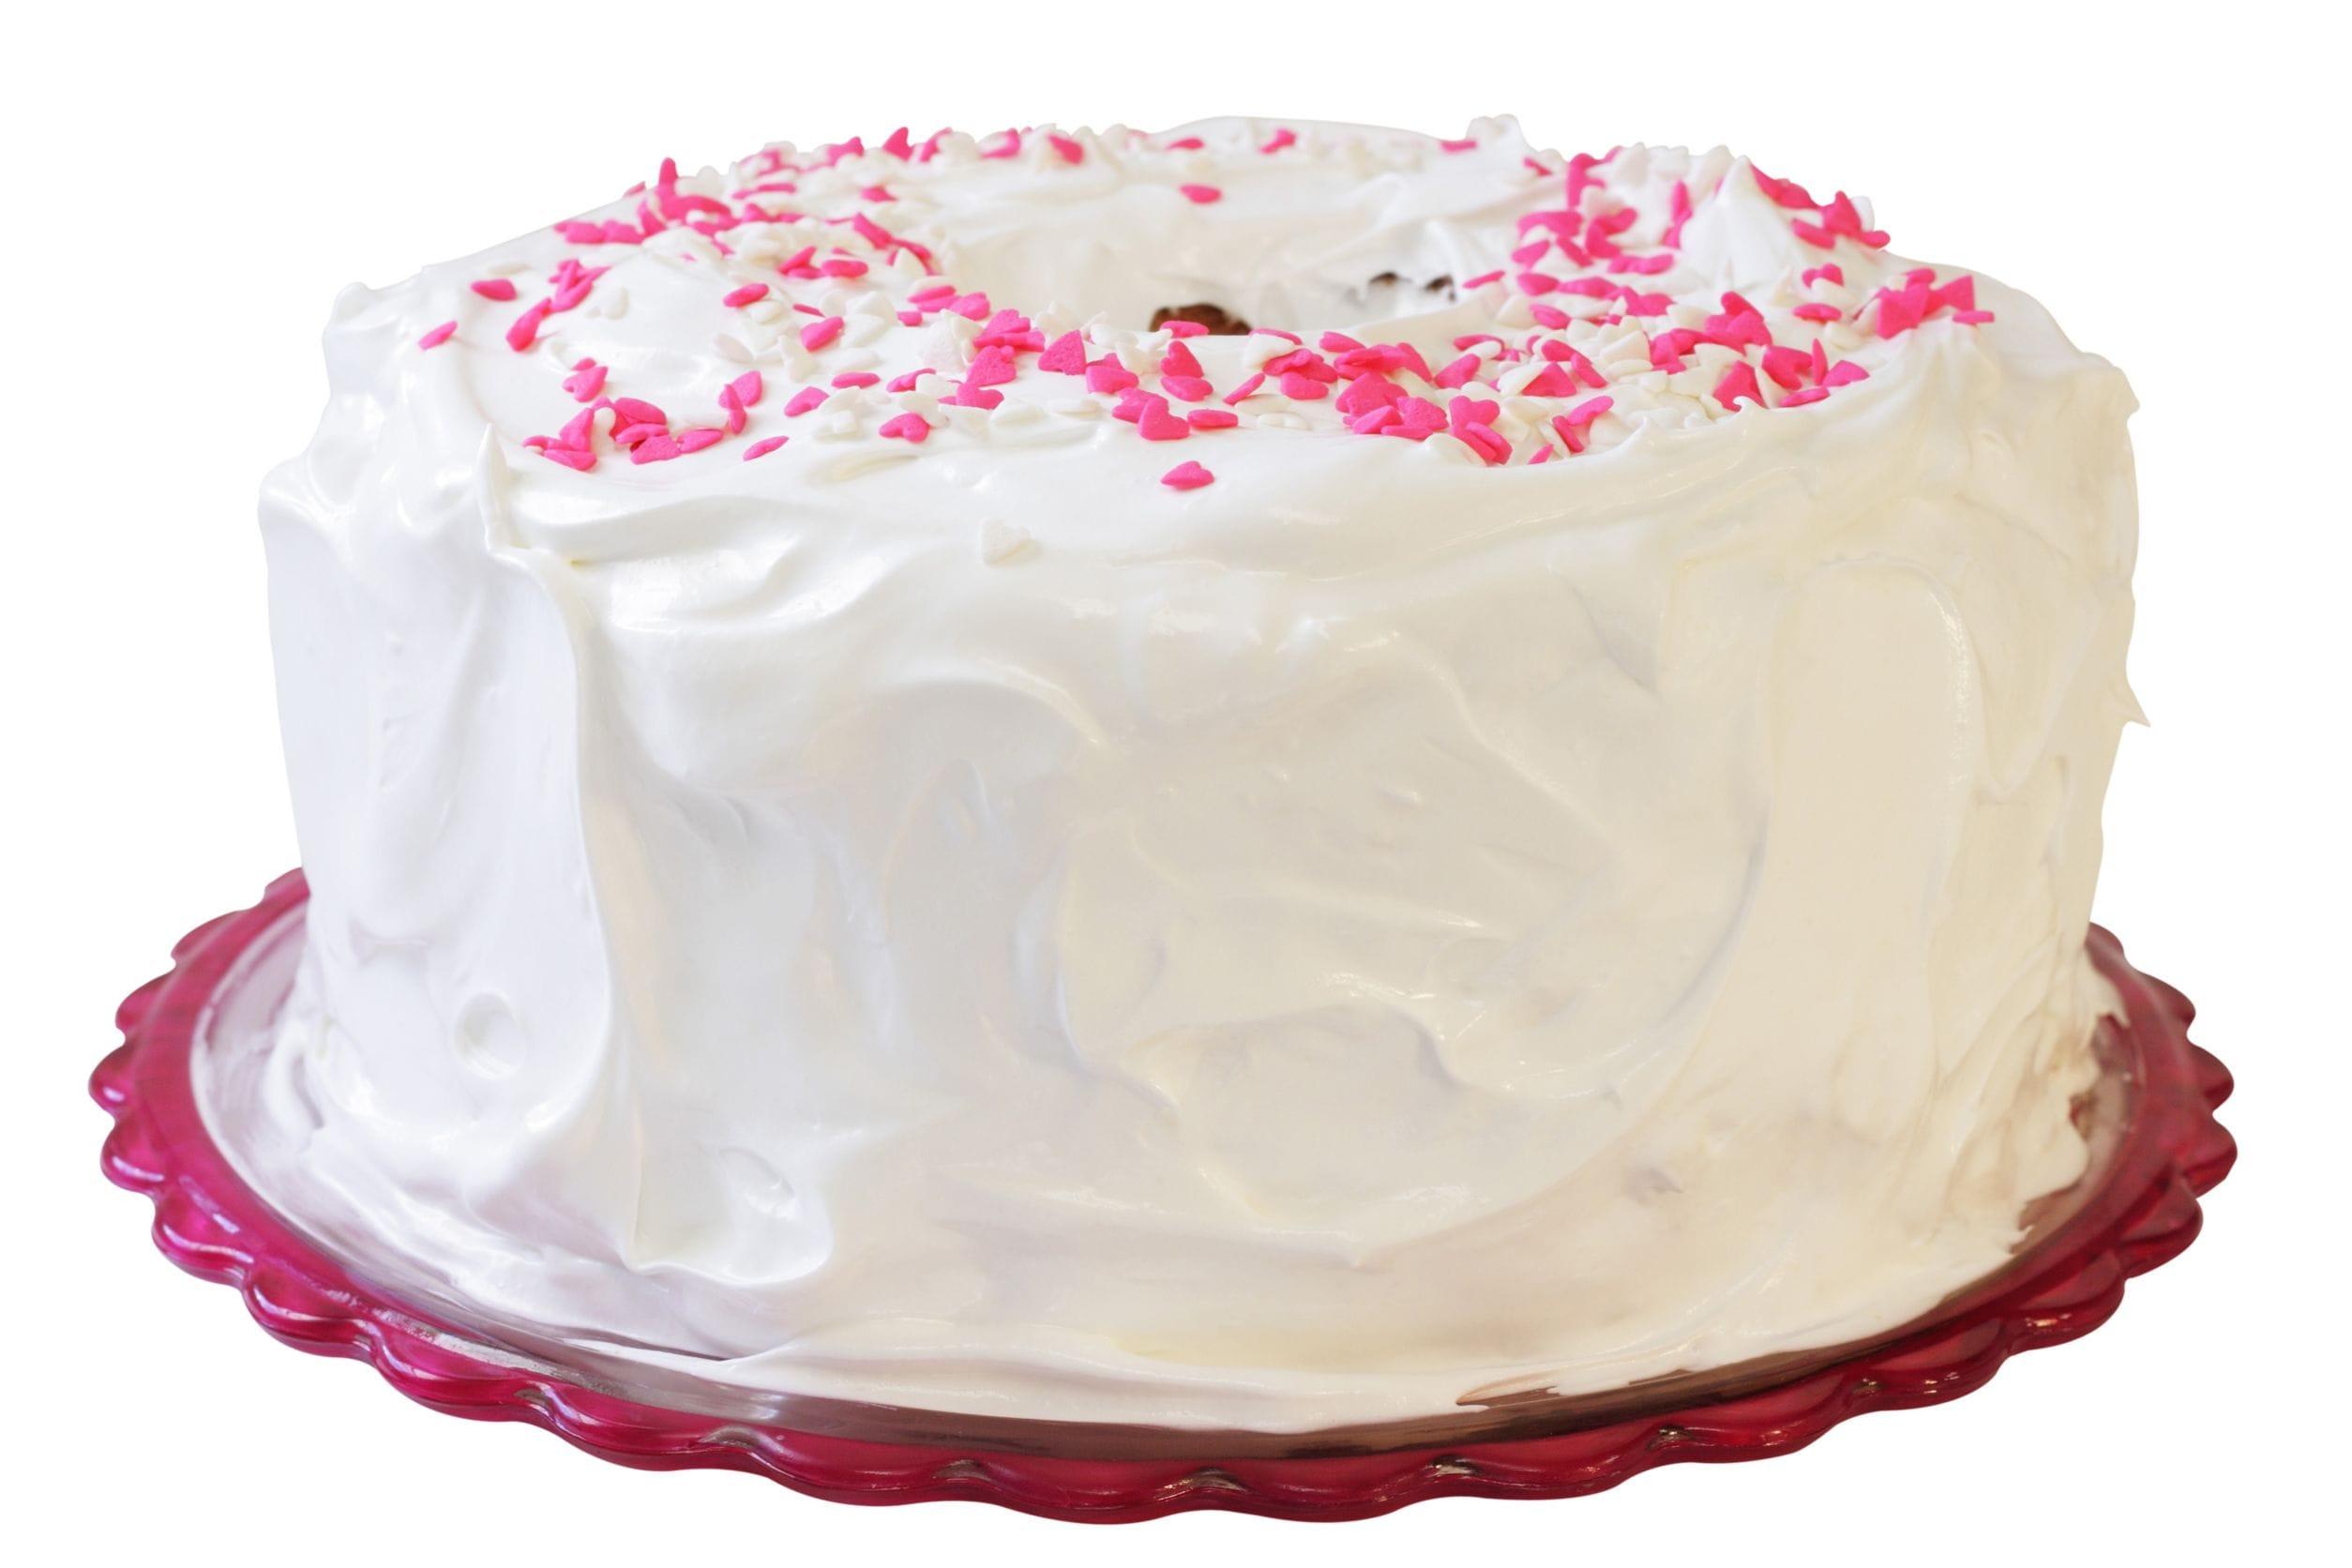 Icing A Angel Food Cake